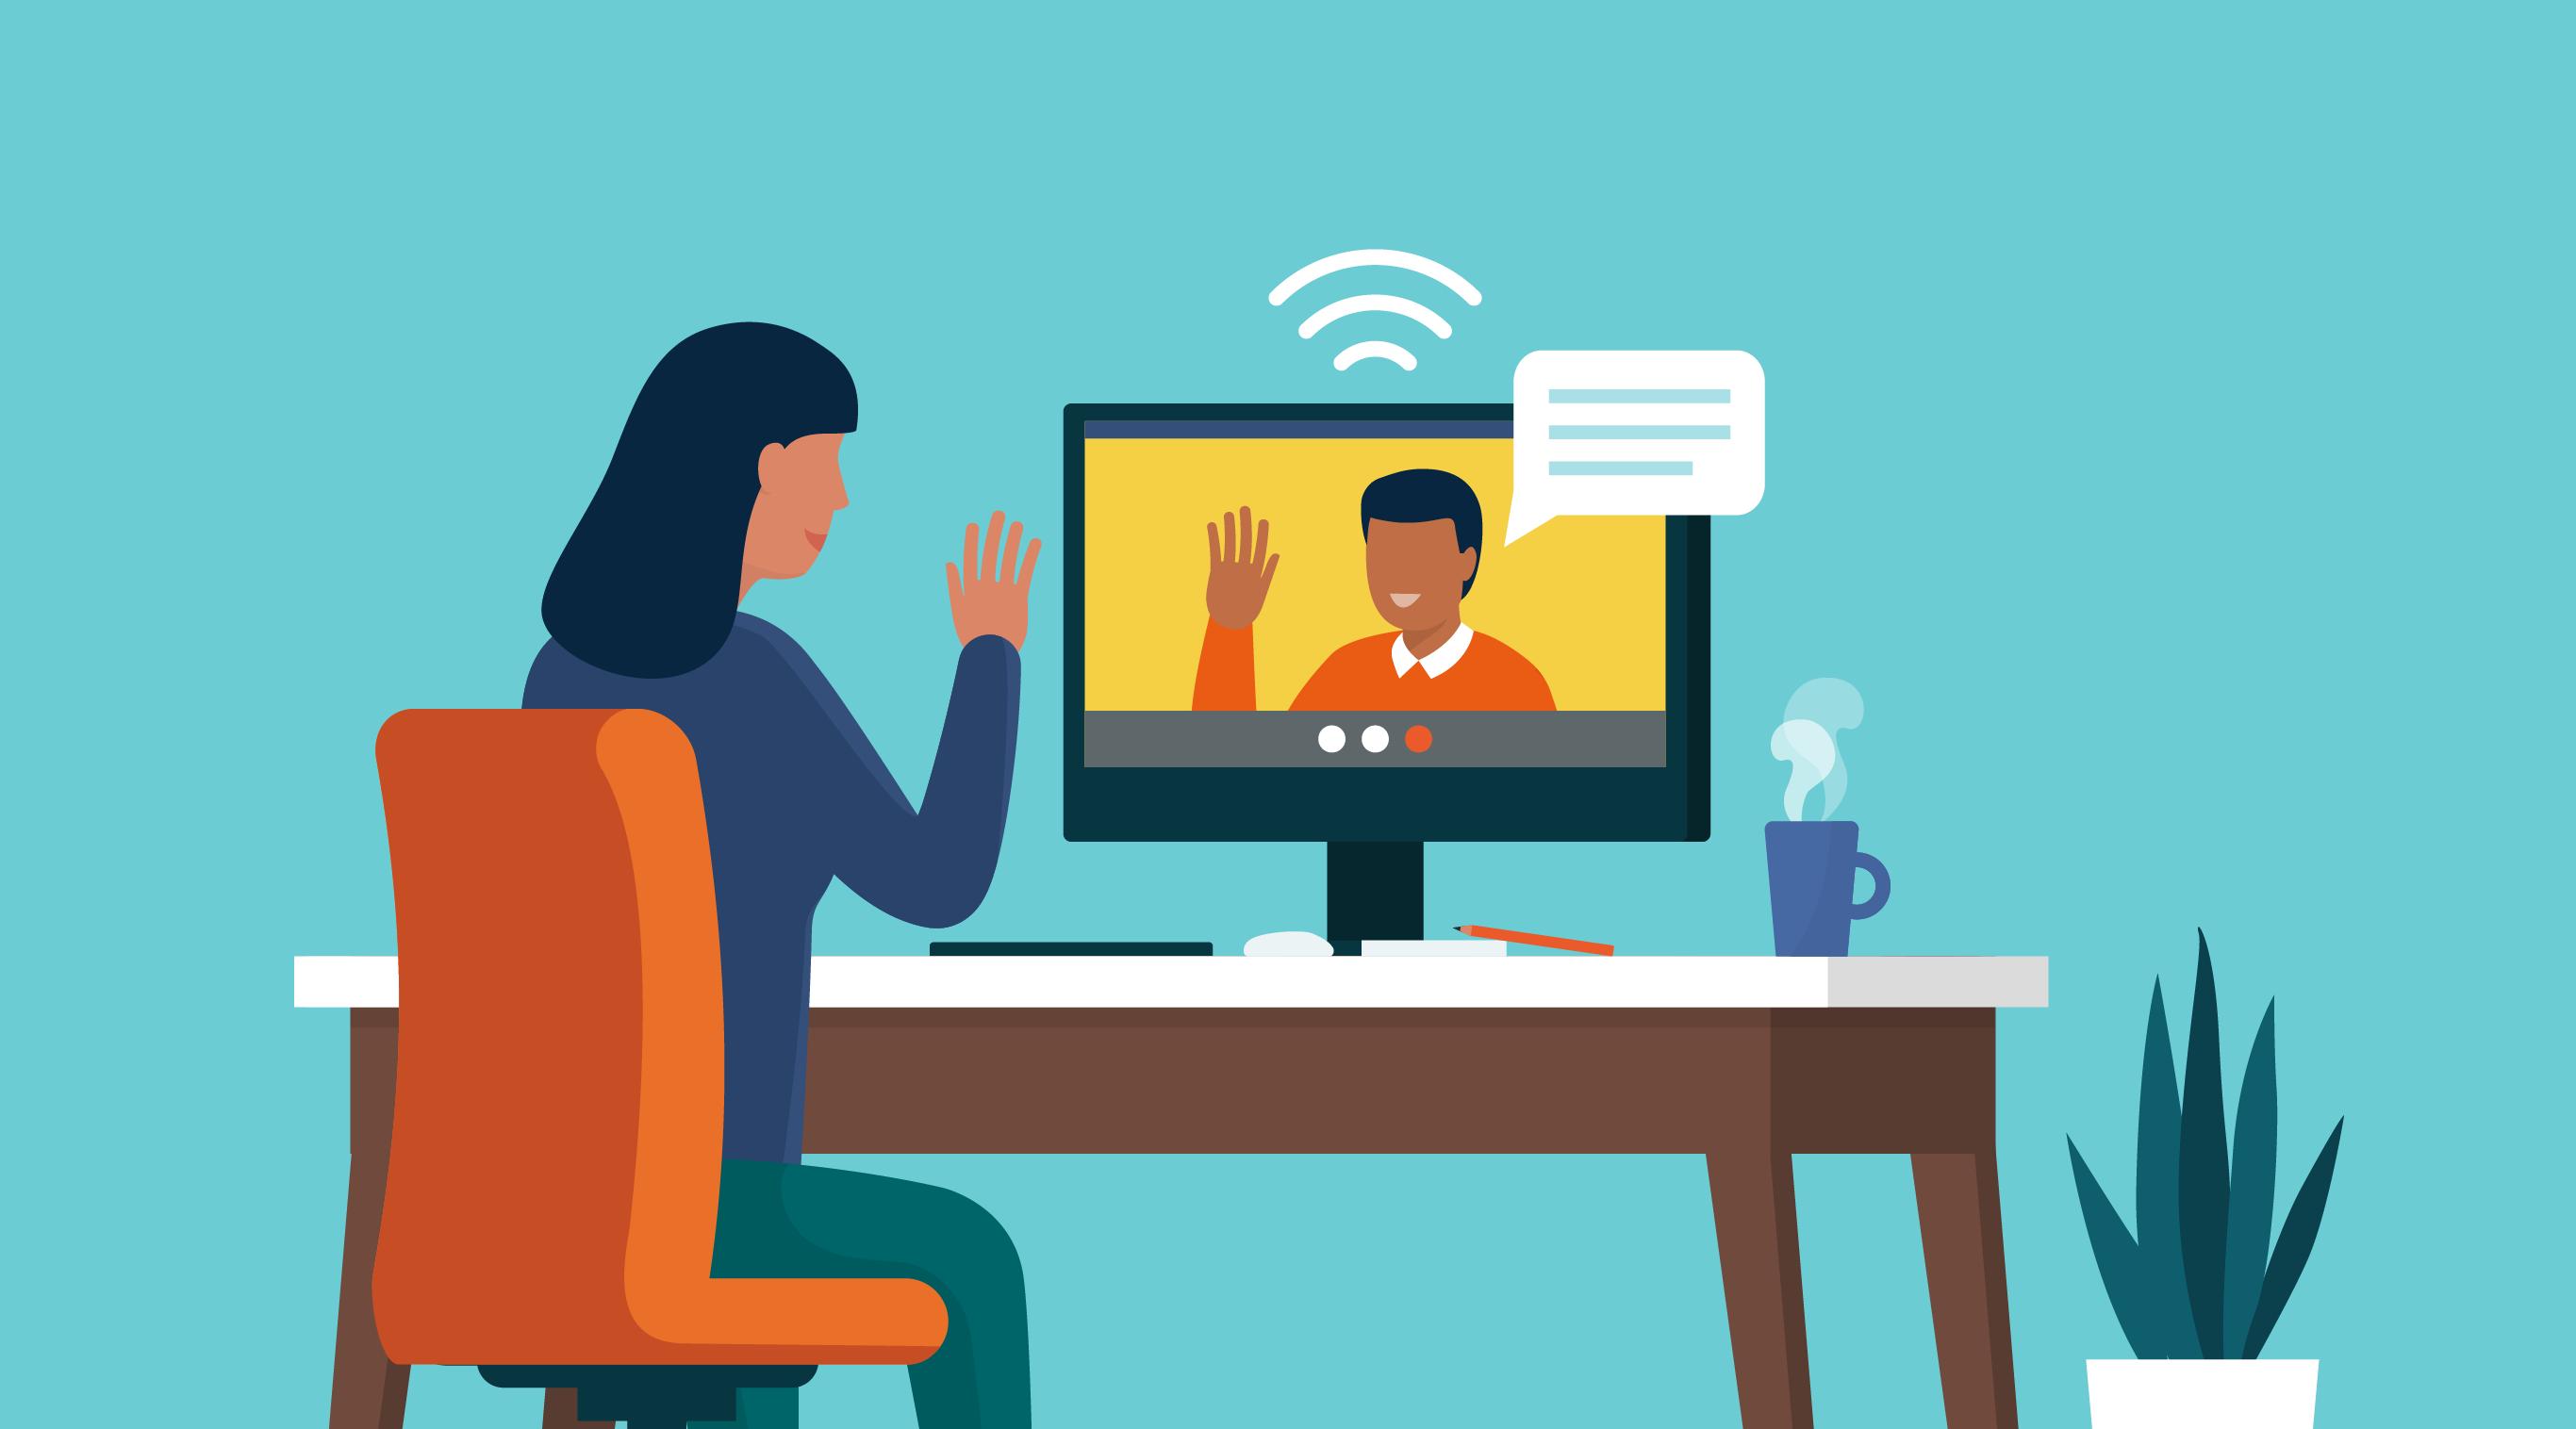 illustration that shows virtual work